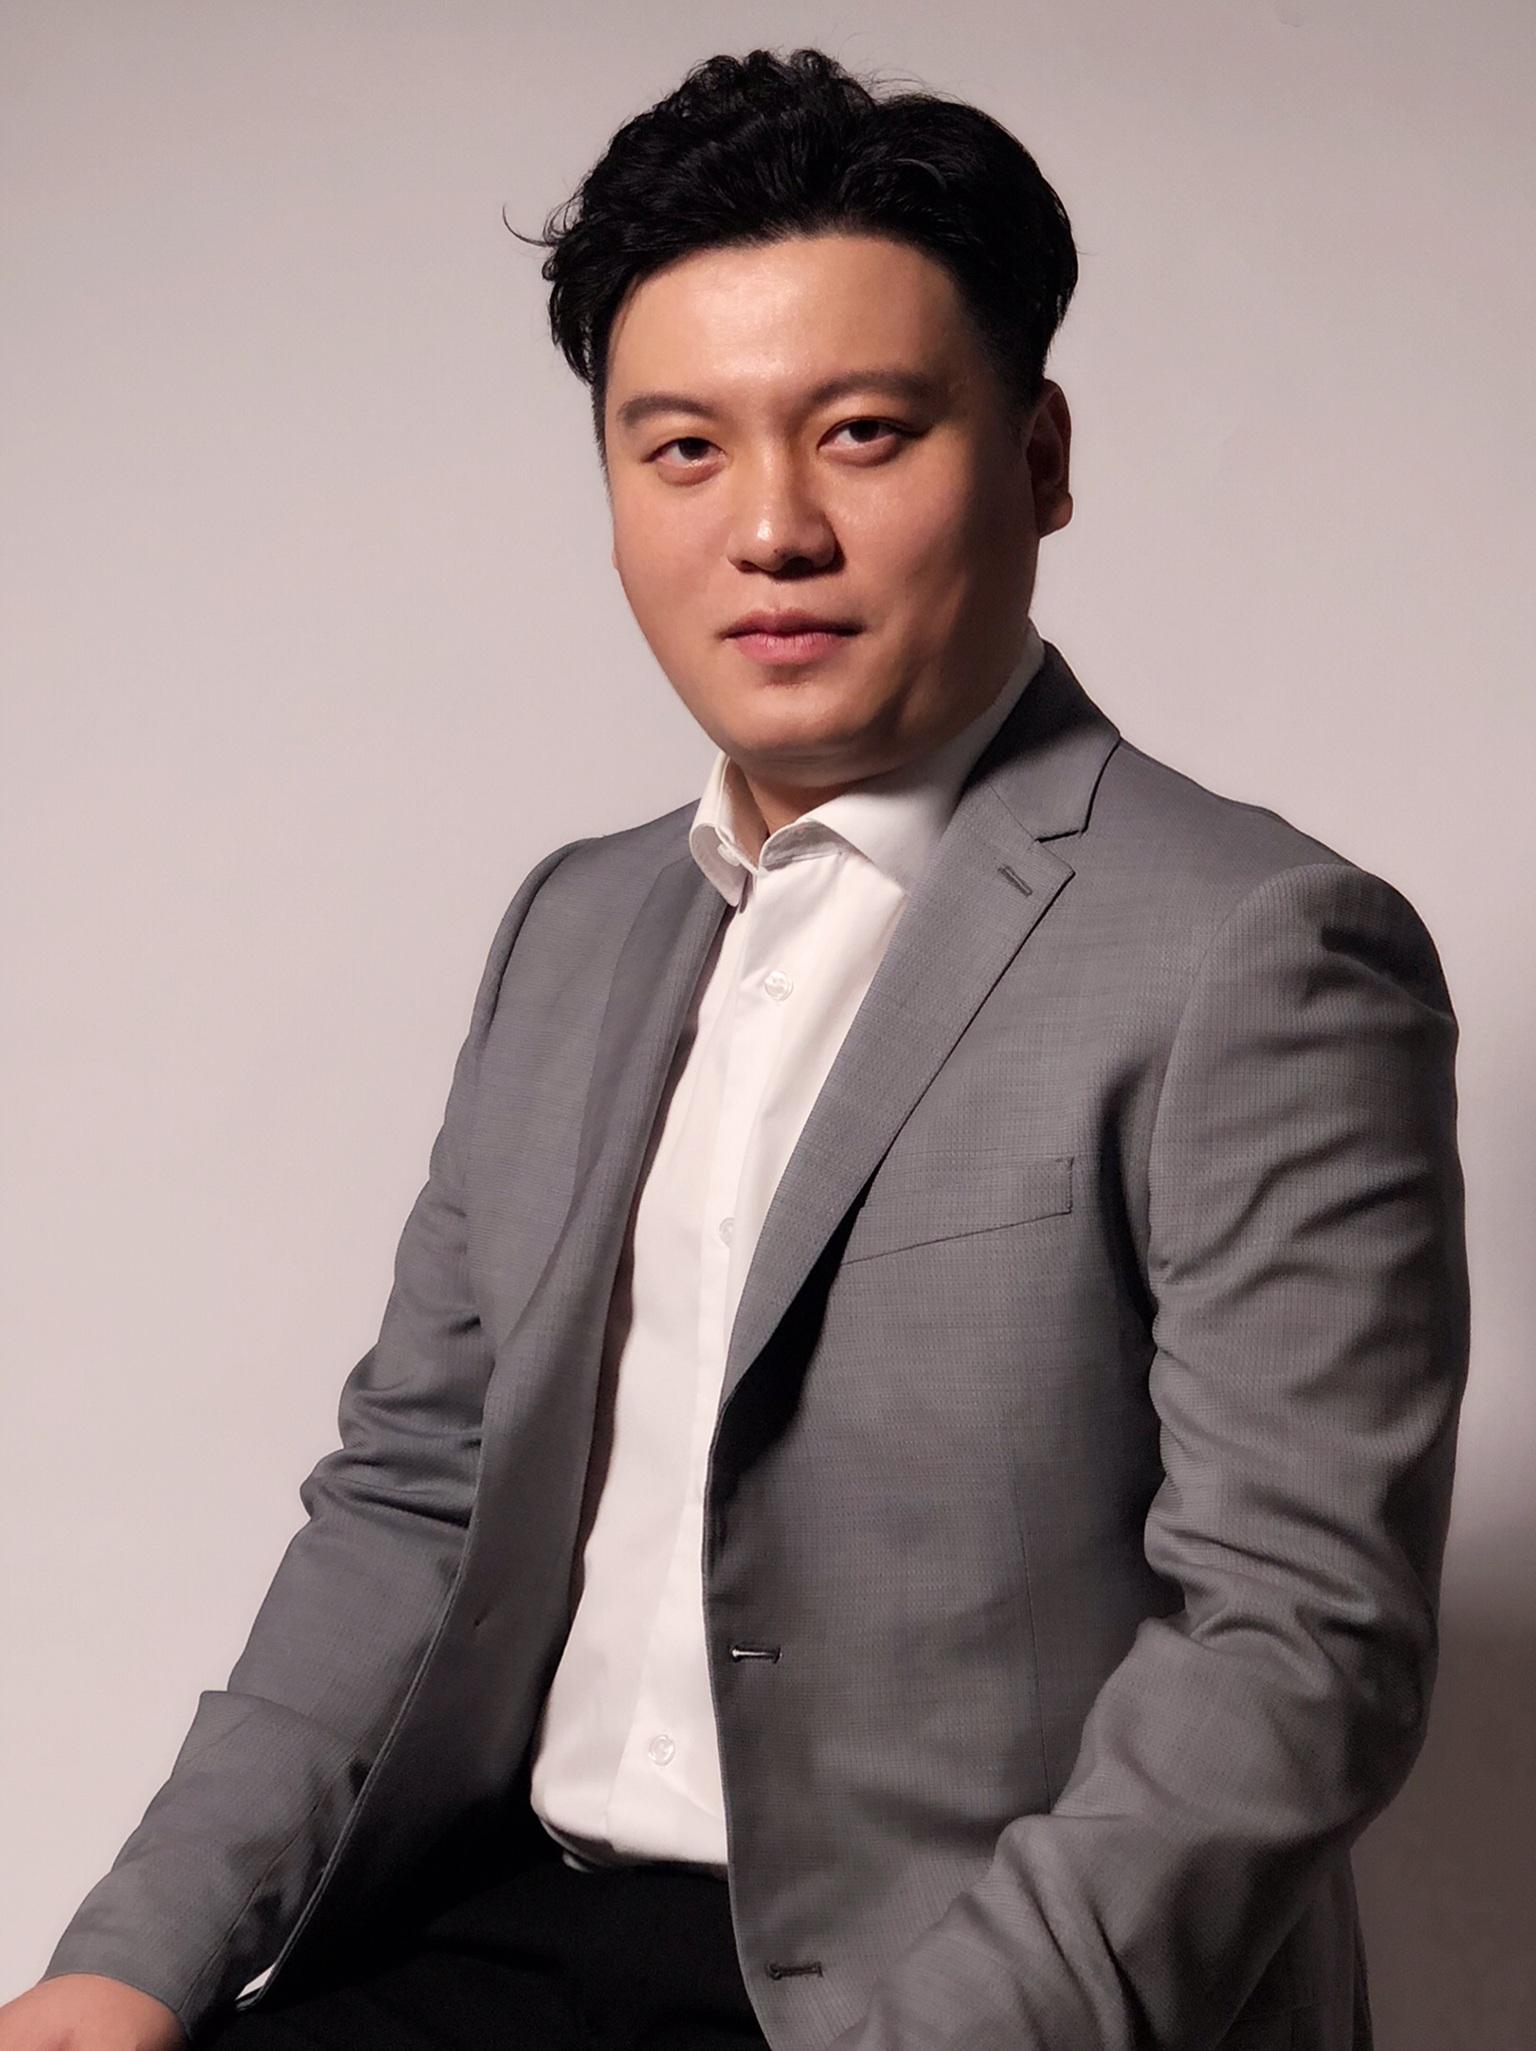 Yongxi_Chen+Headshot.jpg